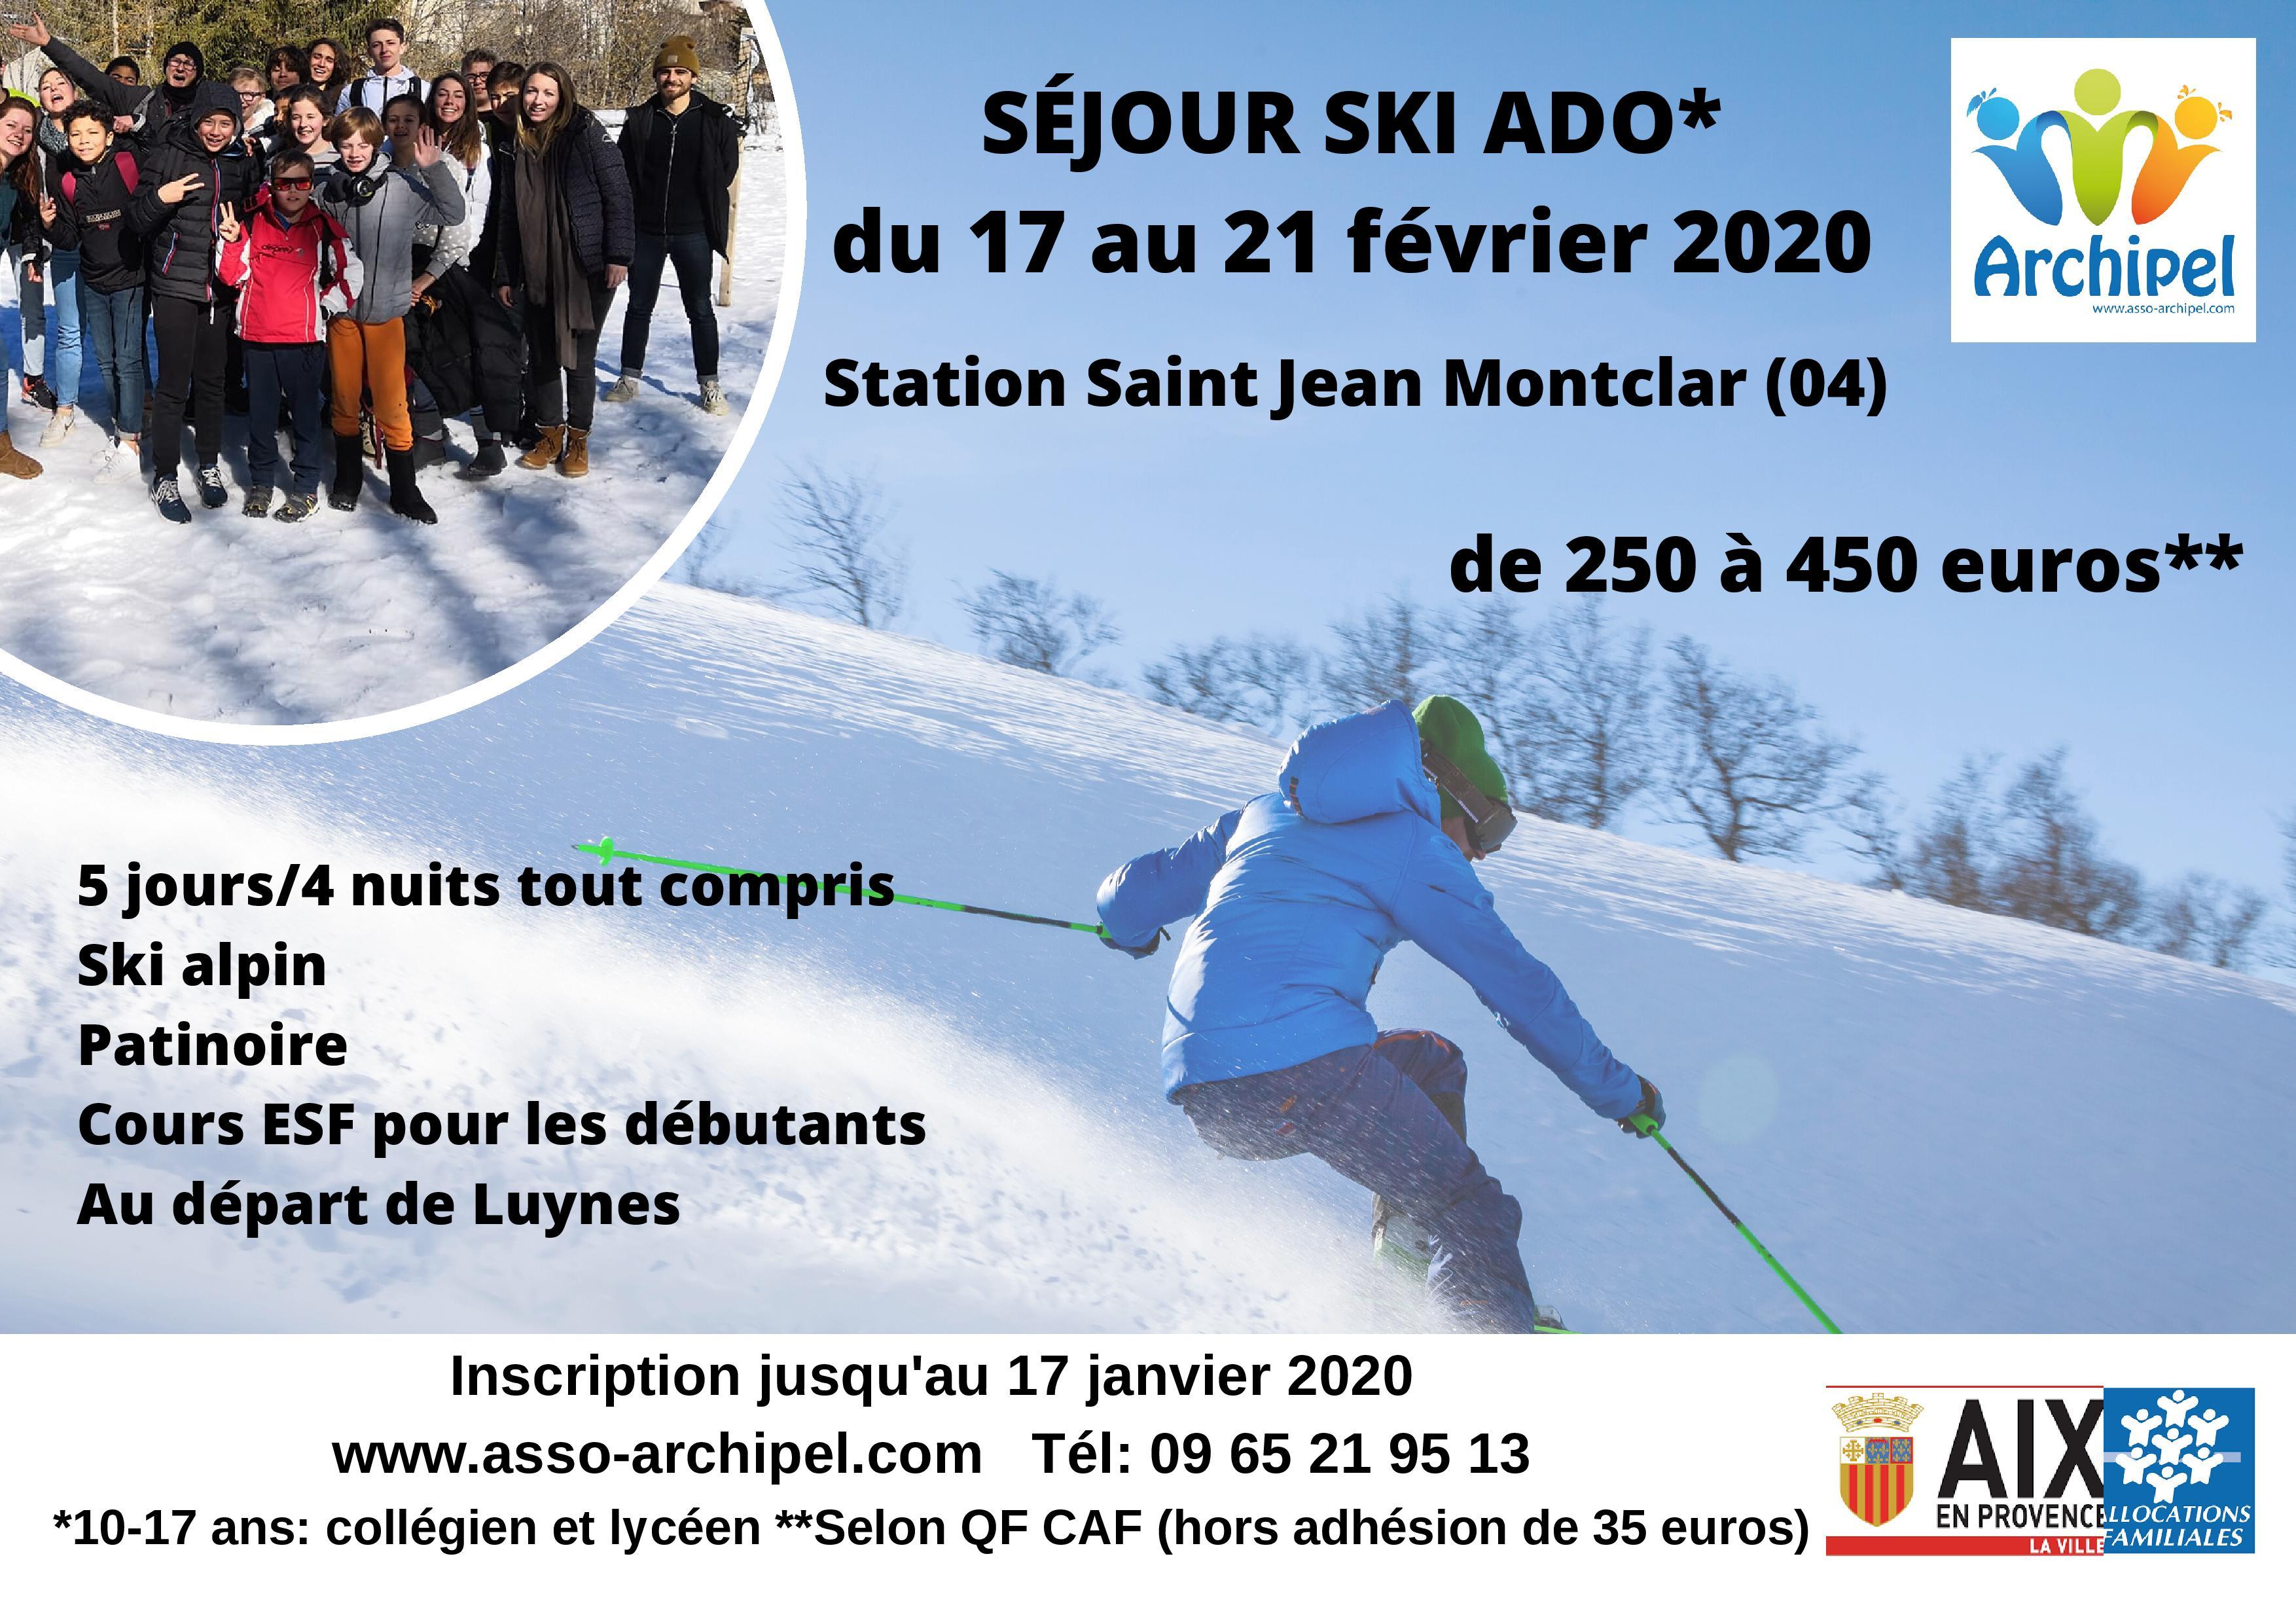 Séjour au ski Station Saint Jean Montclar